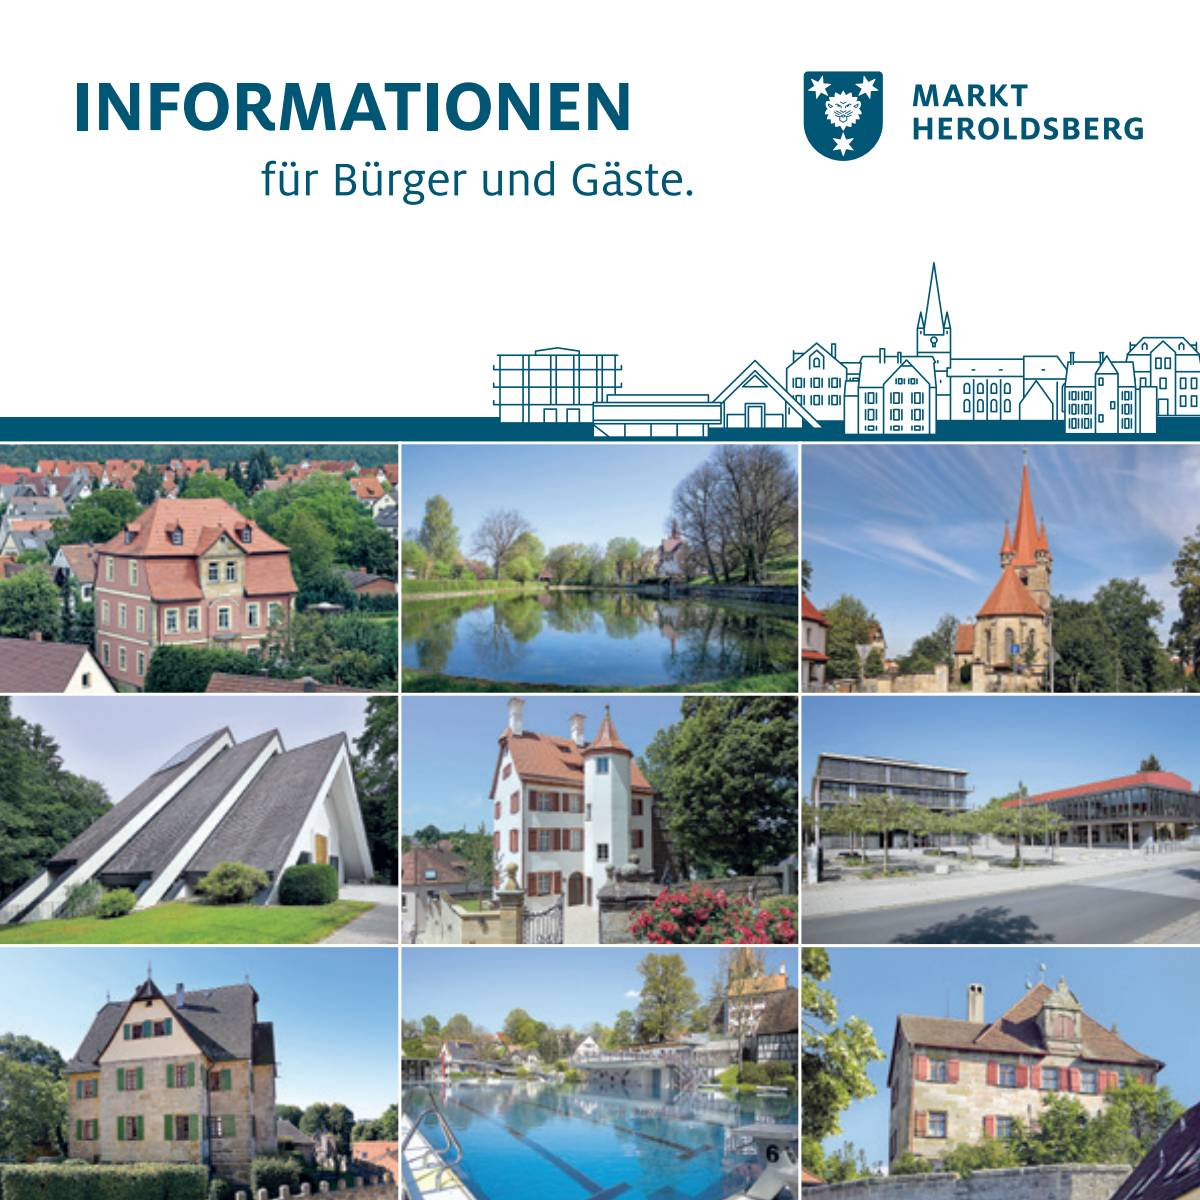 Image-Broschüre Markt Heroldsberg